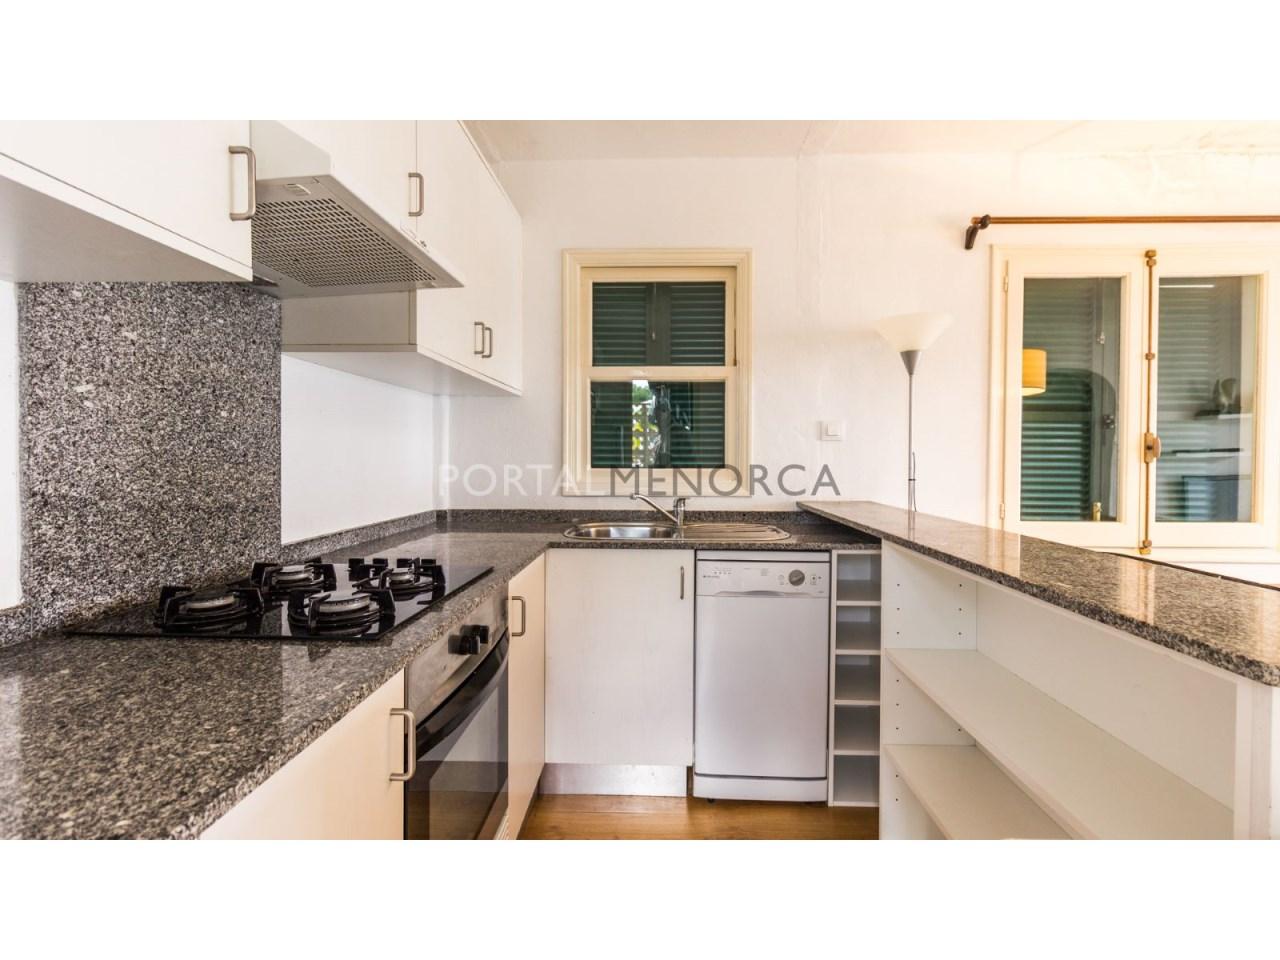 apartamento en venta en Arenal d'en Castell (5 de 11)